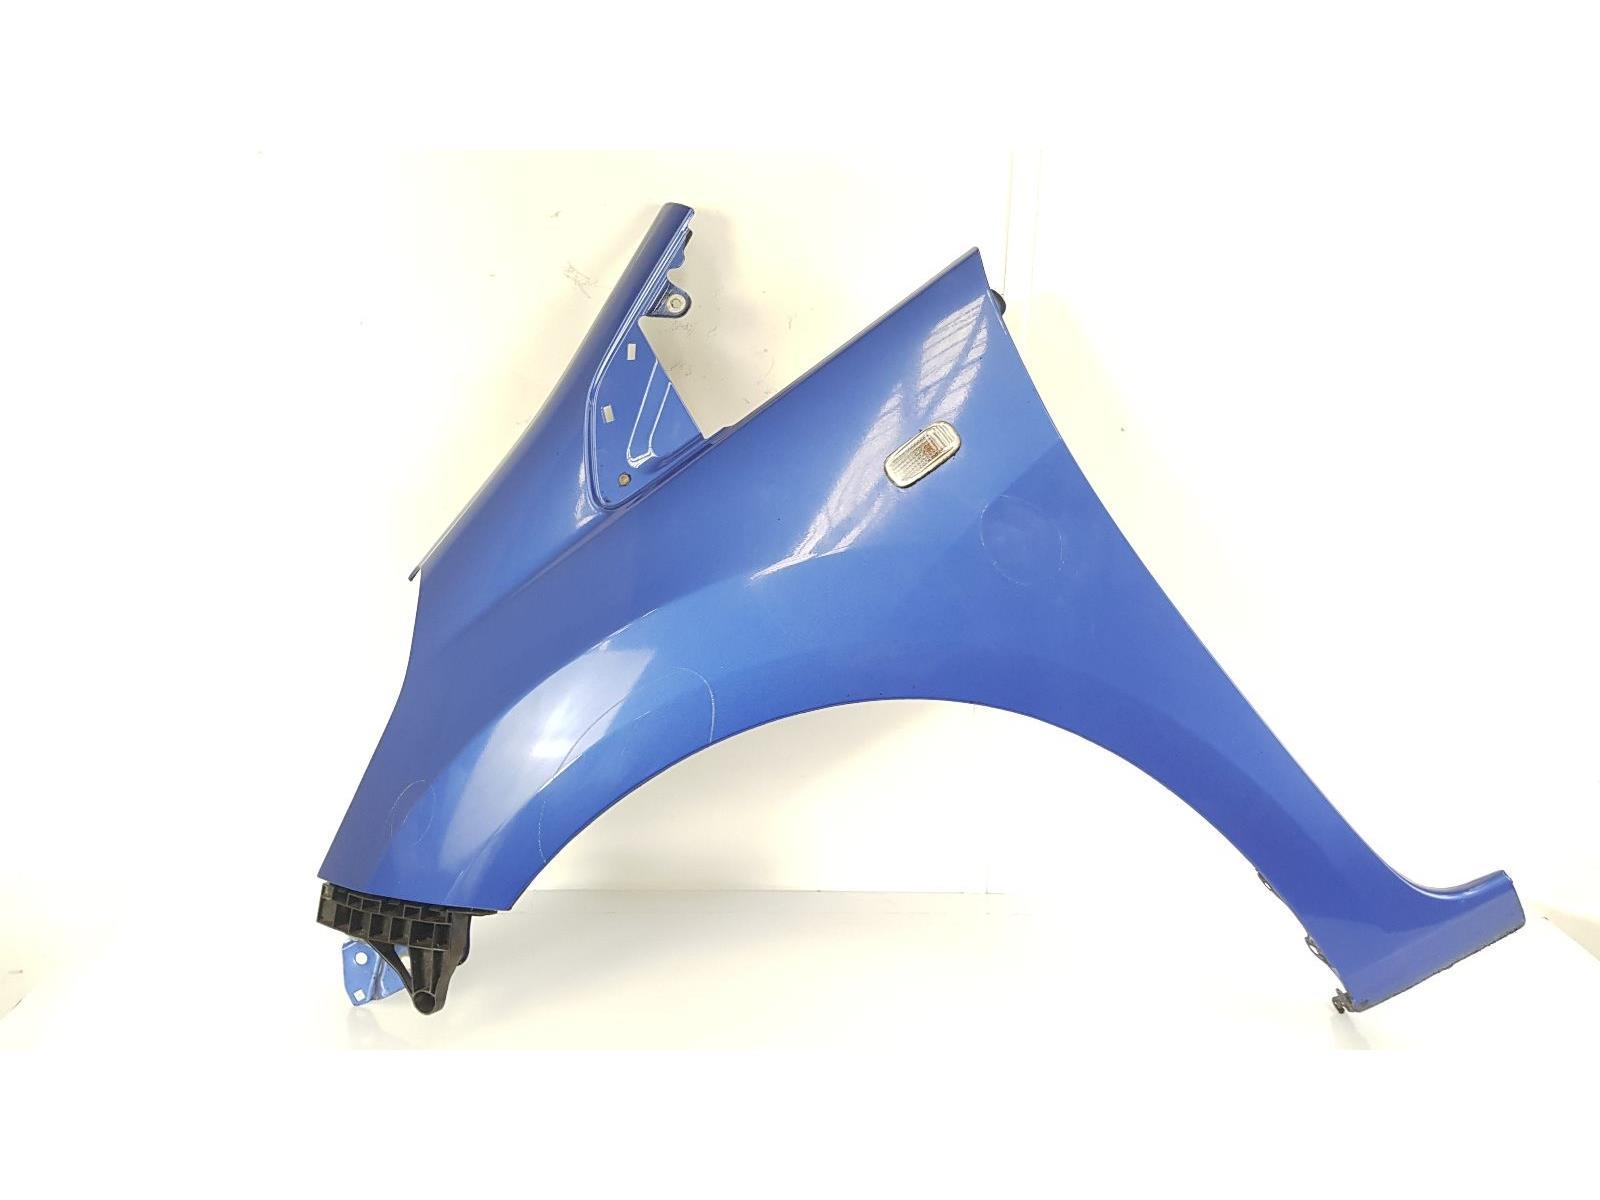 2011-2015 MK3 HONDA JAZZ FRONT WING LH Passenger Side BLUE